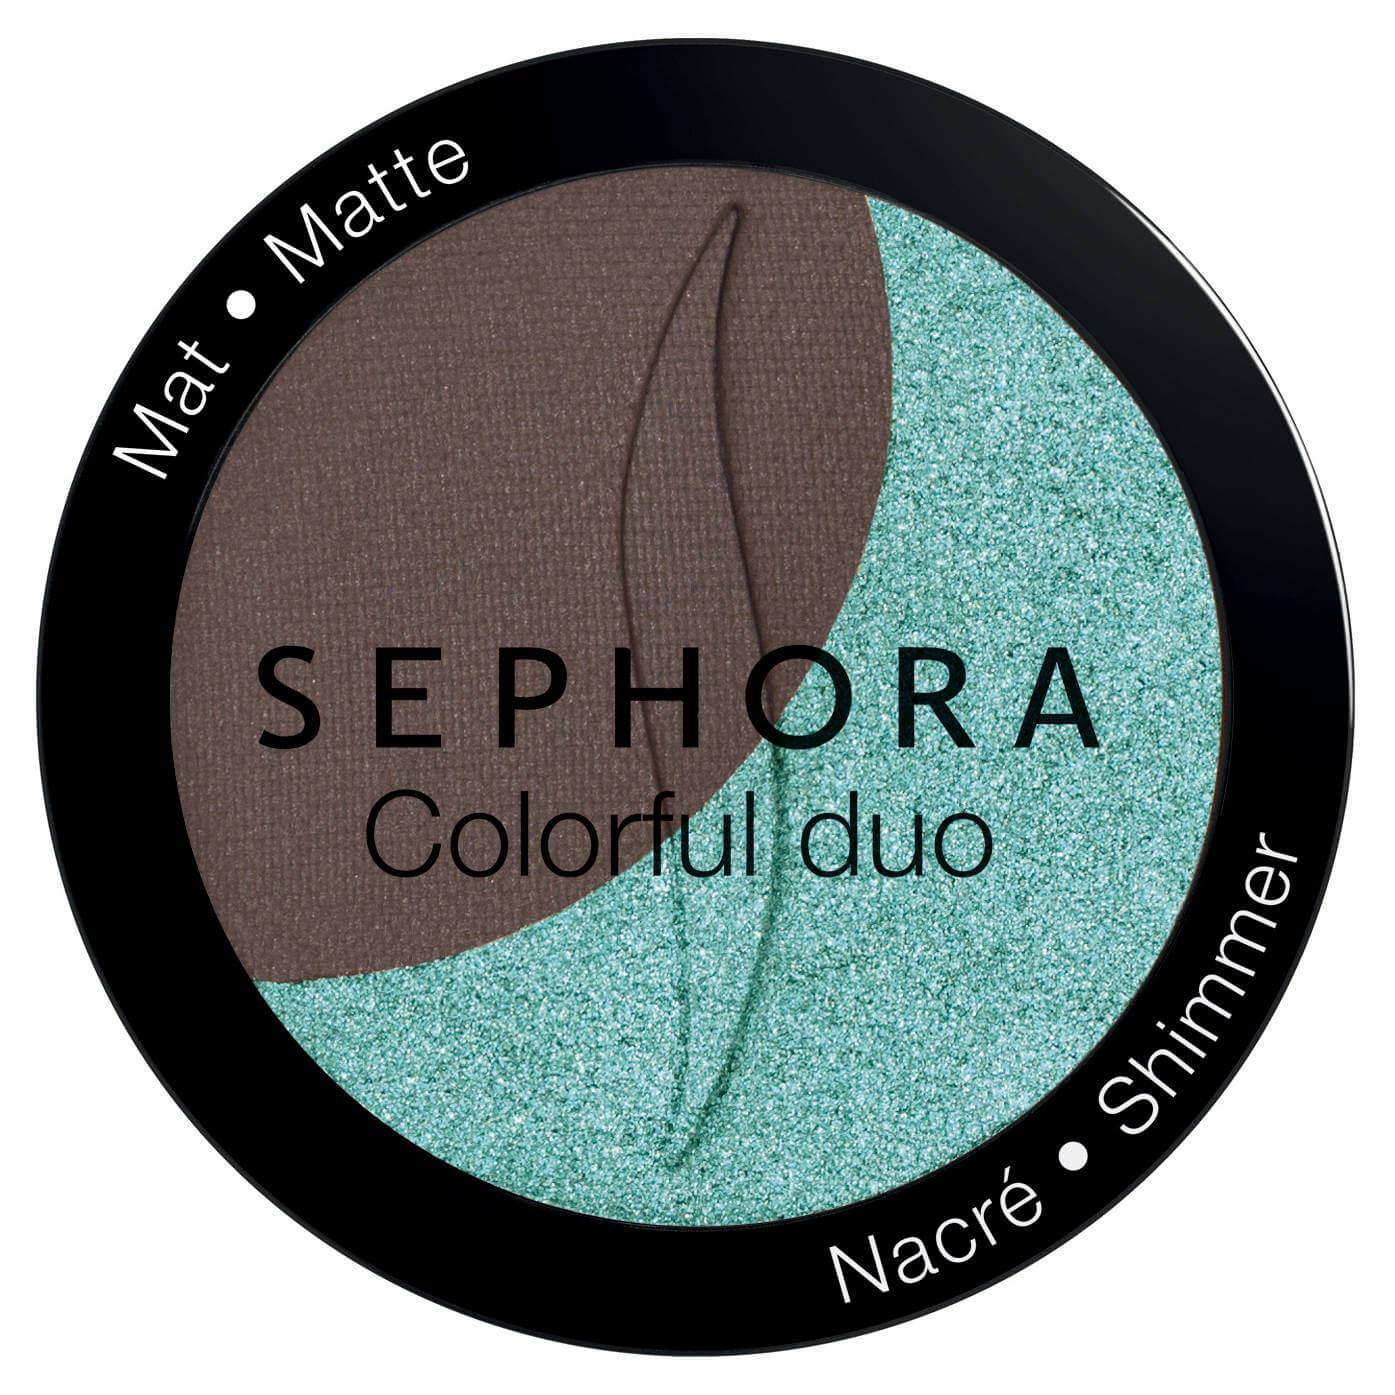 bingo-colorful-duo-ombres-a-paupieres-sephora-madeinsephora-hivency-partenariat-makeupbyazadig